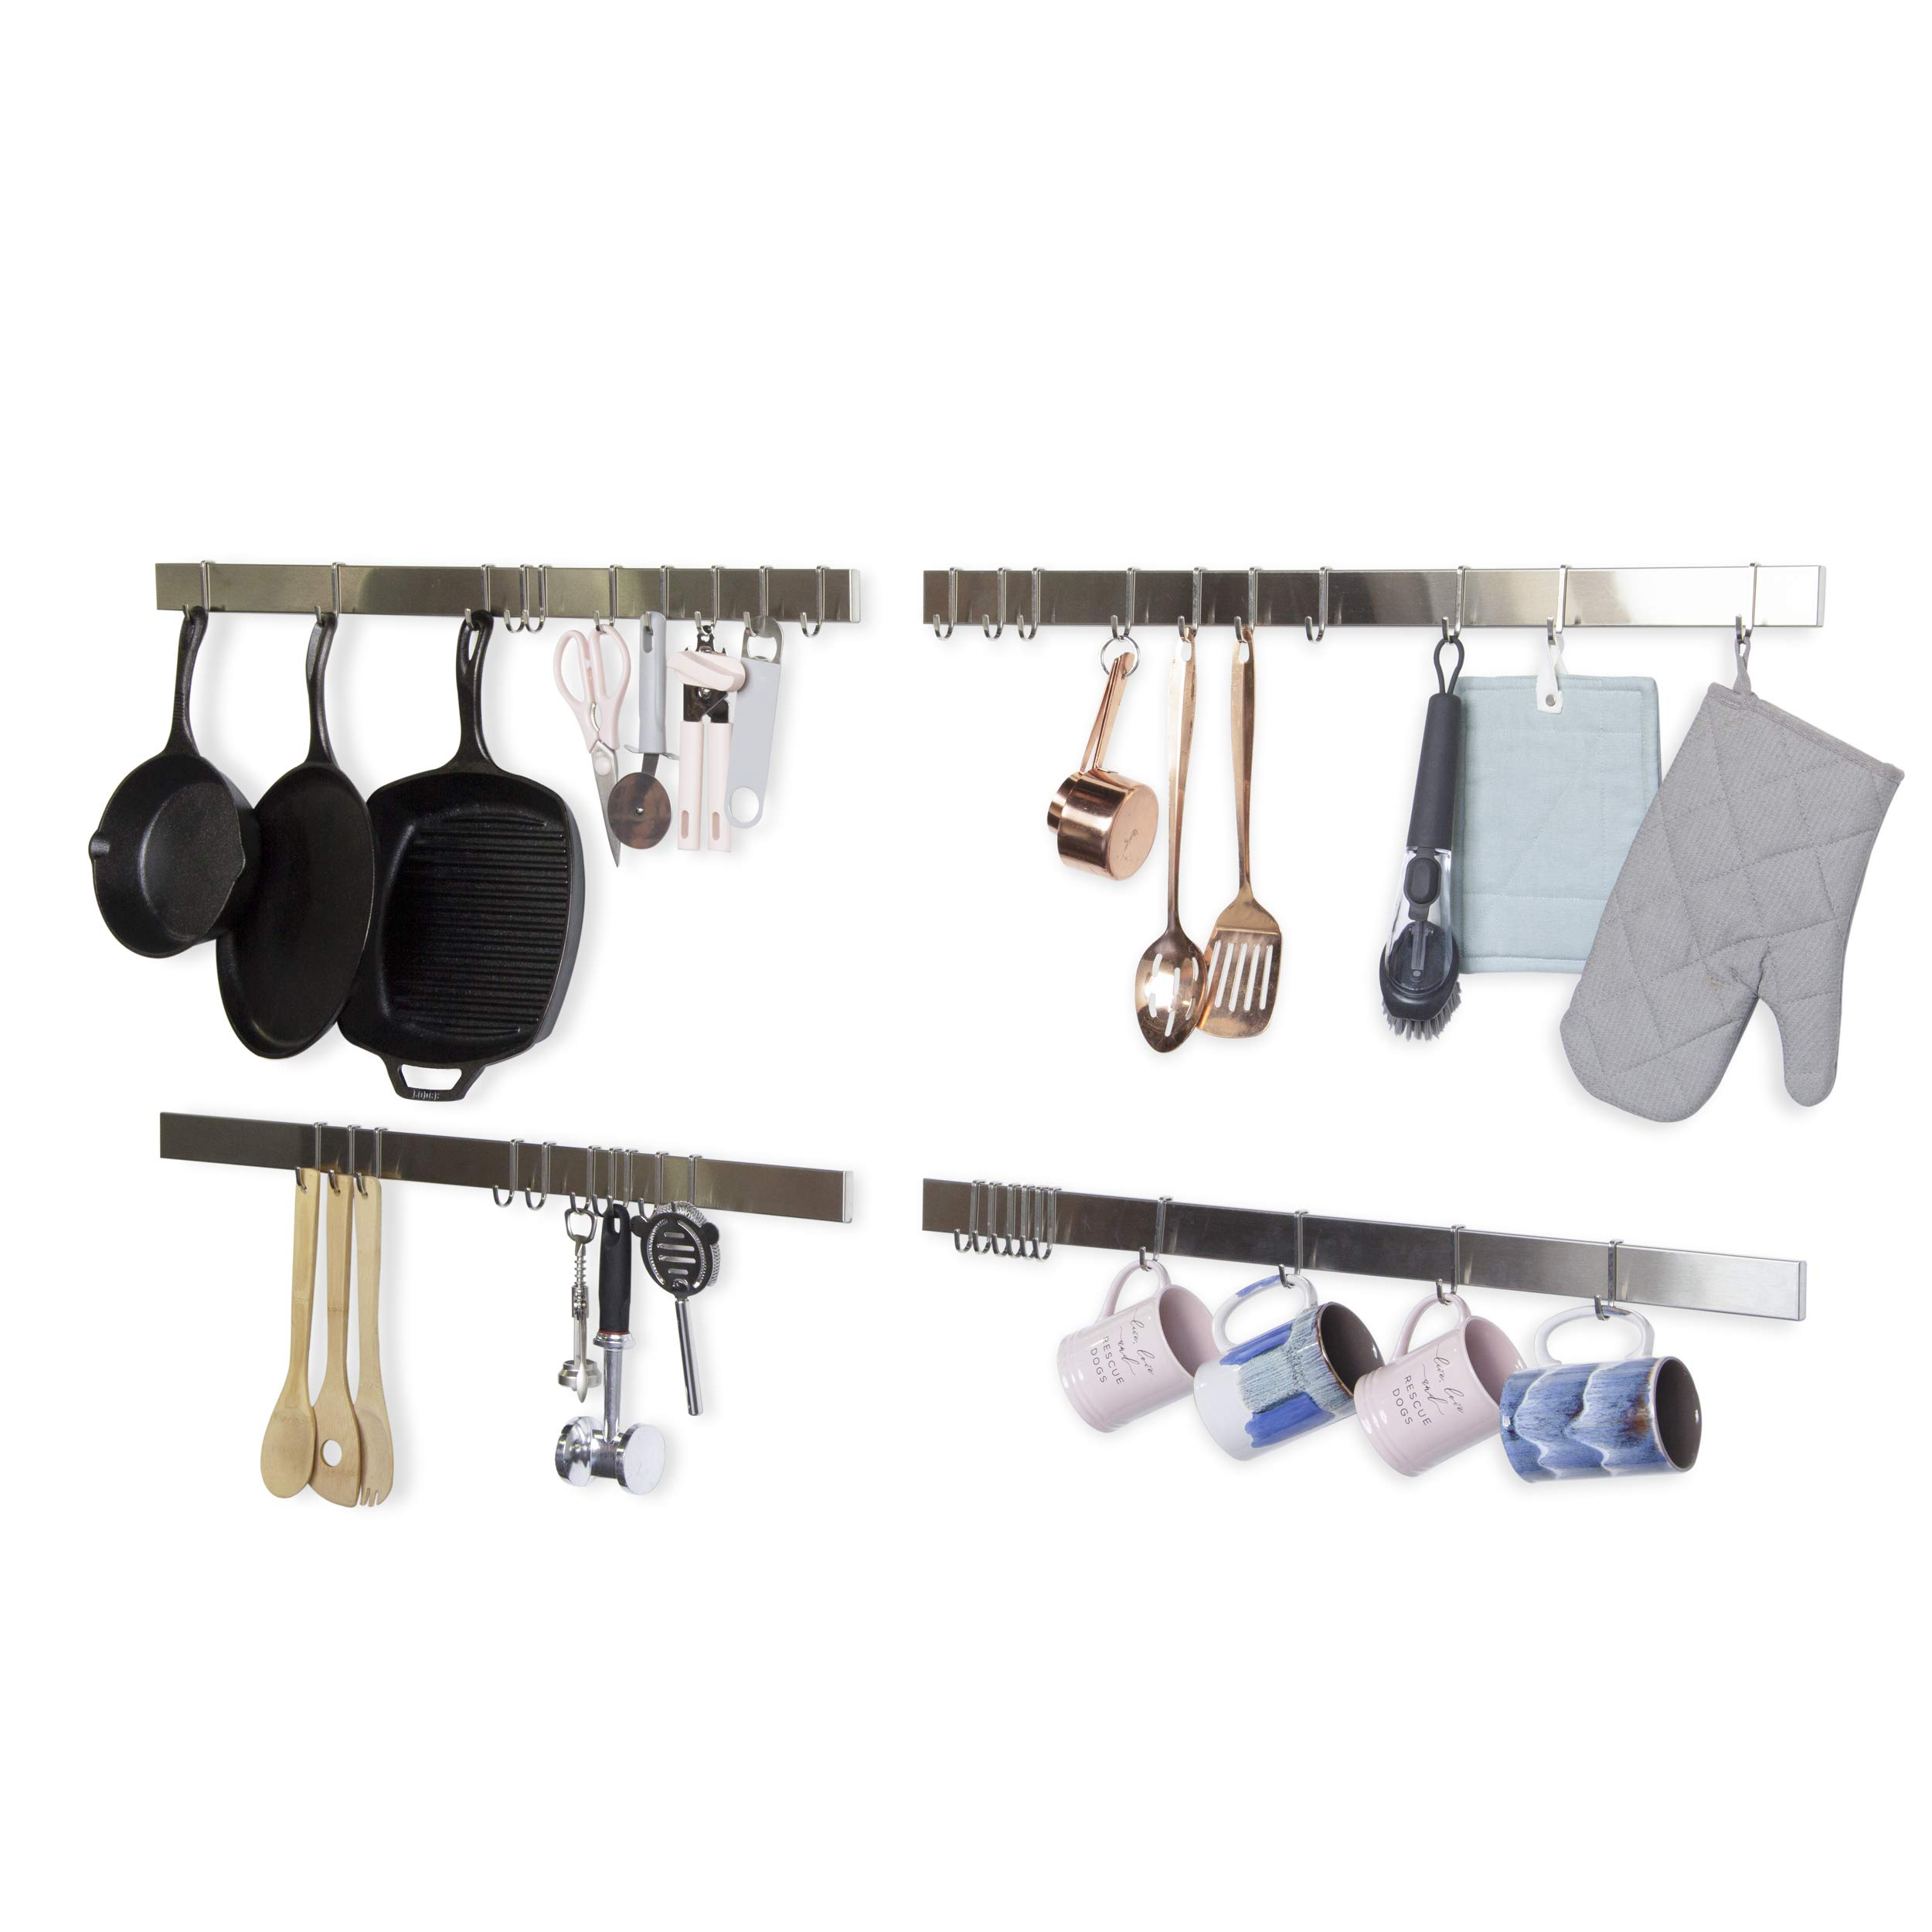 Wallniture Kitchen Bar Rail Pot Pan Lid Rack Organizer Chrome 30 Inch Set of 4